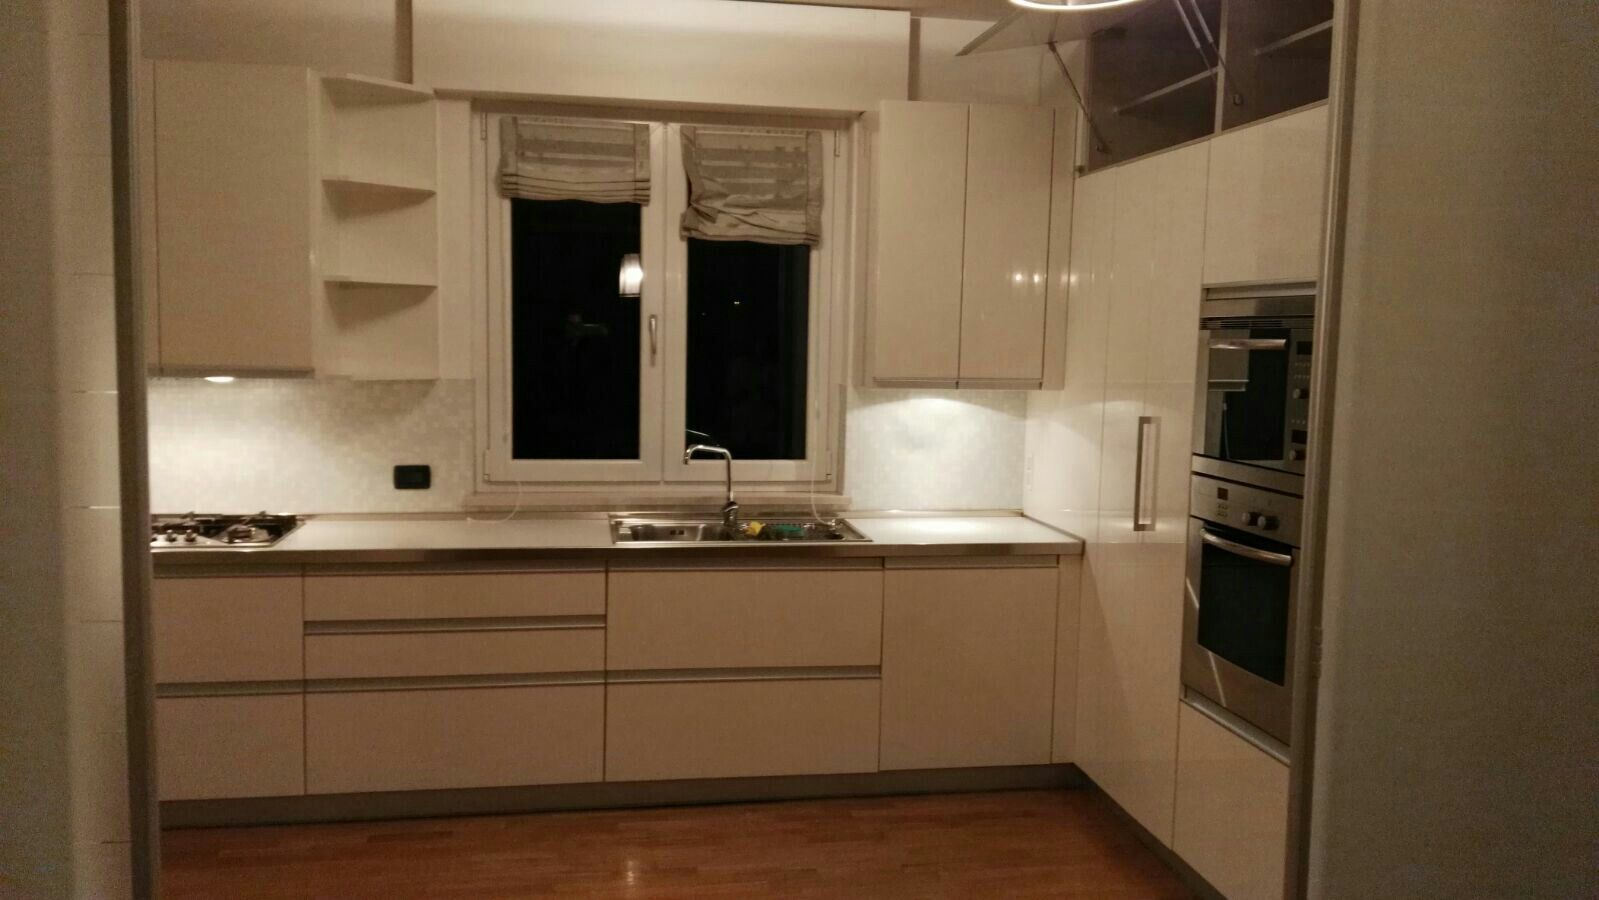 Cucina Biefbi in legno laccato lucido bianco, alta qualità, perfette ...